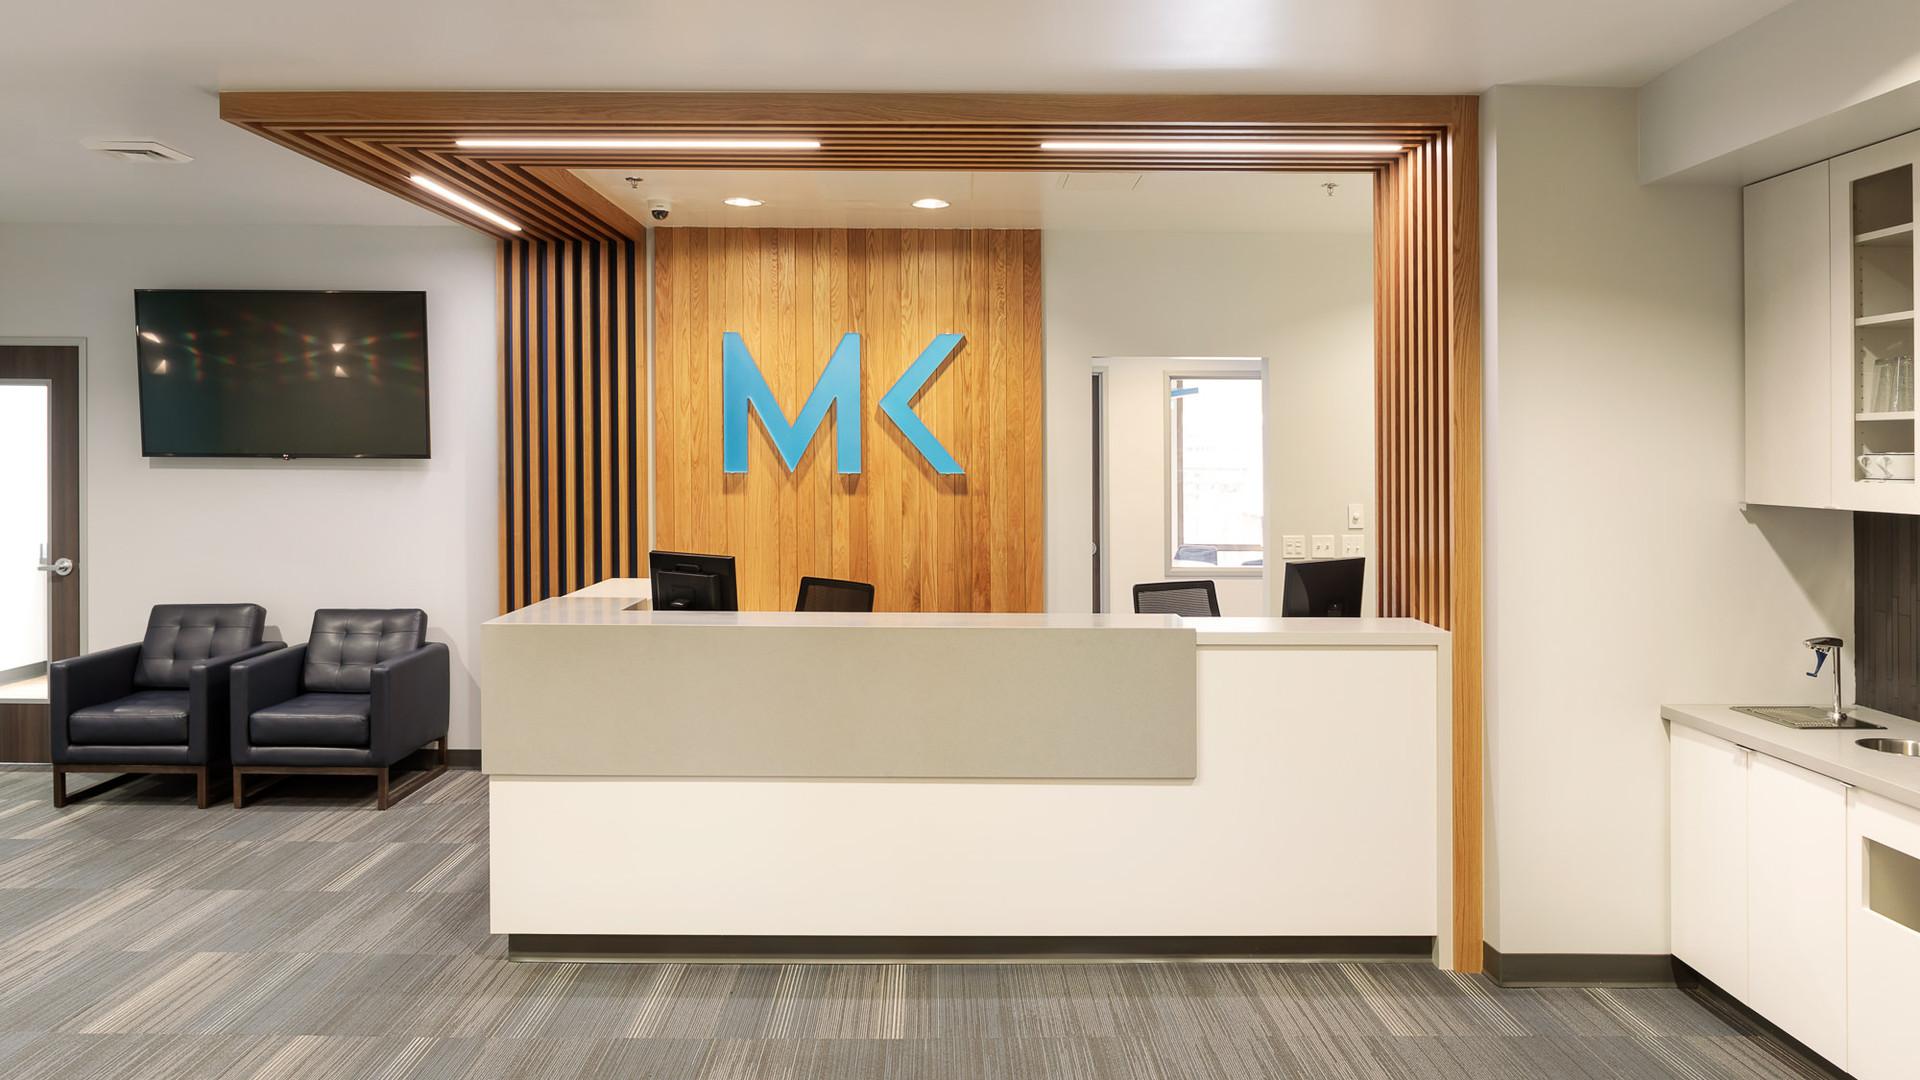 MK Distinctive Dentistry